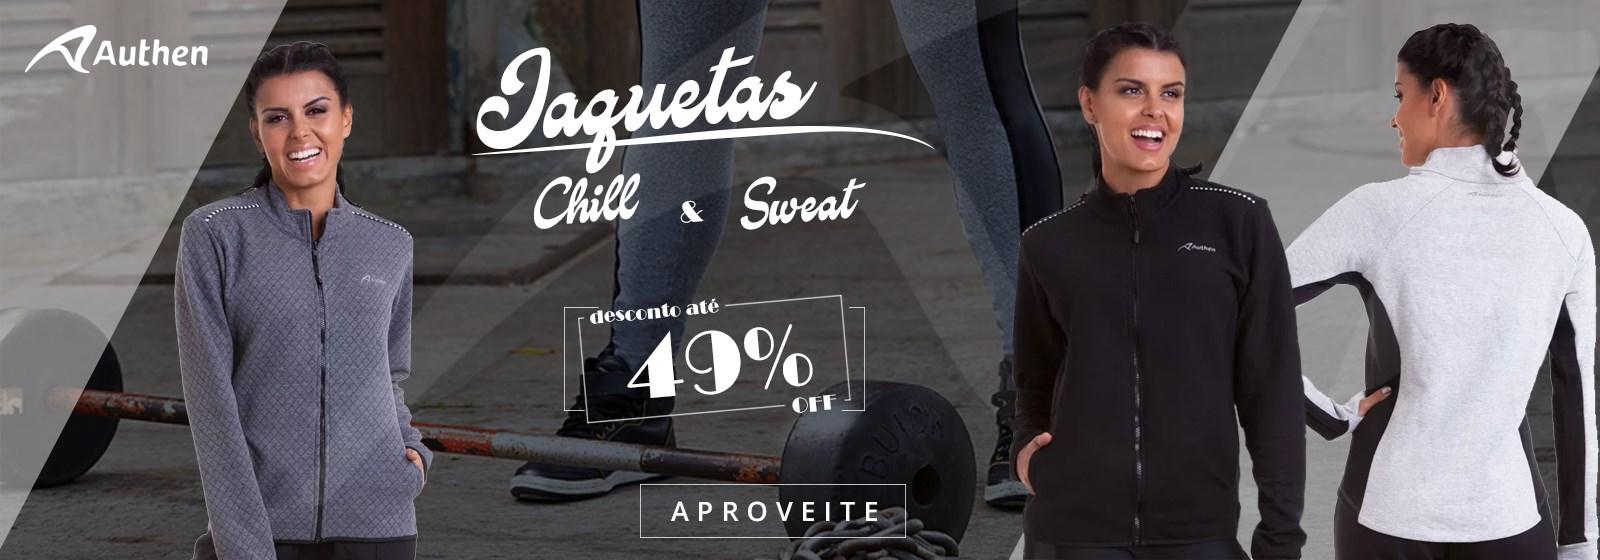 Jaquetas Authen Até 49% de Desconto